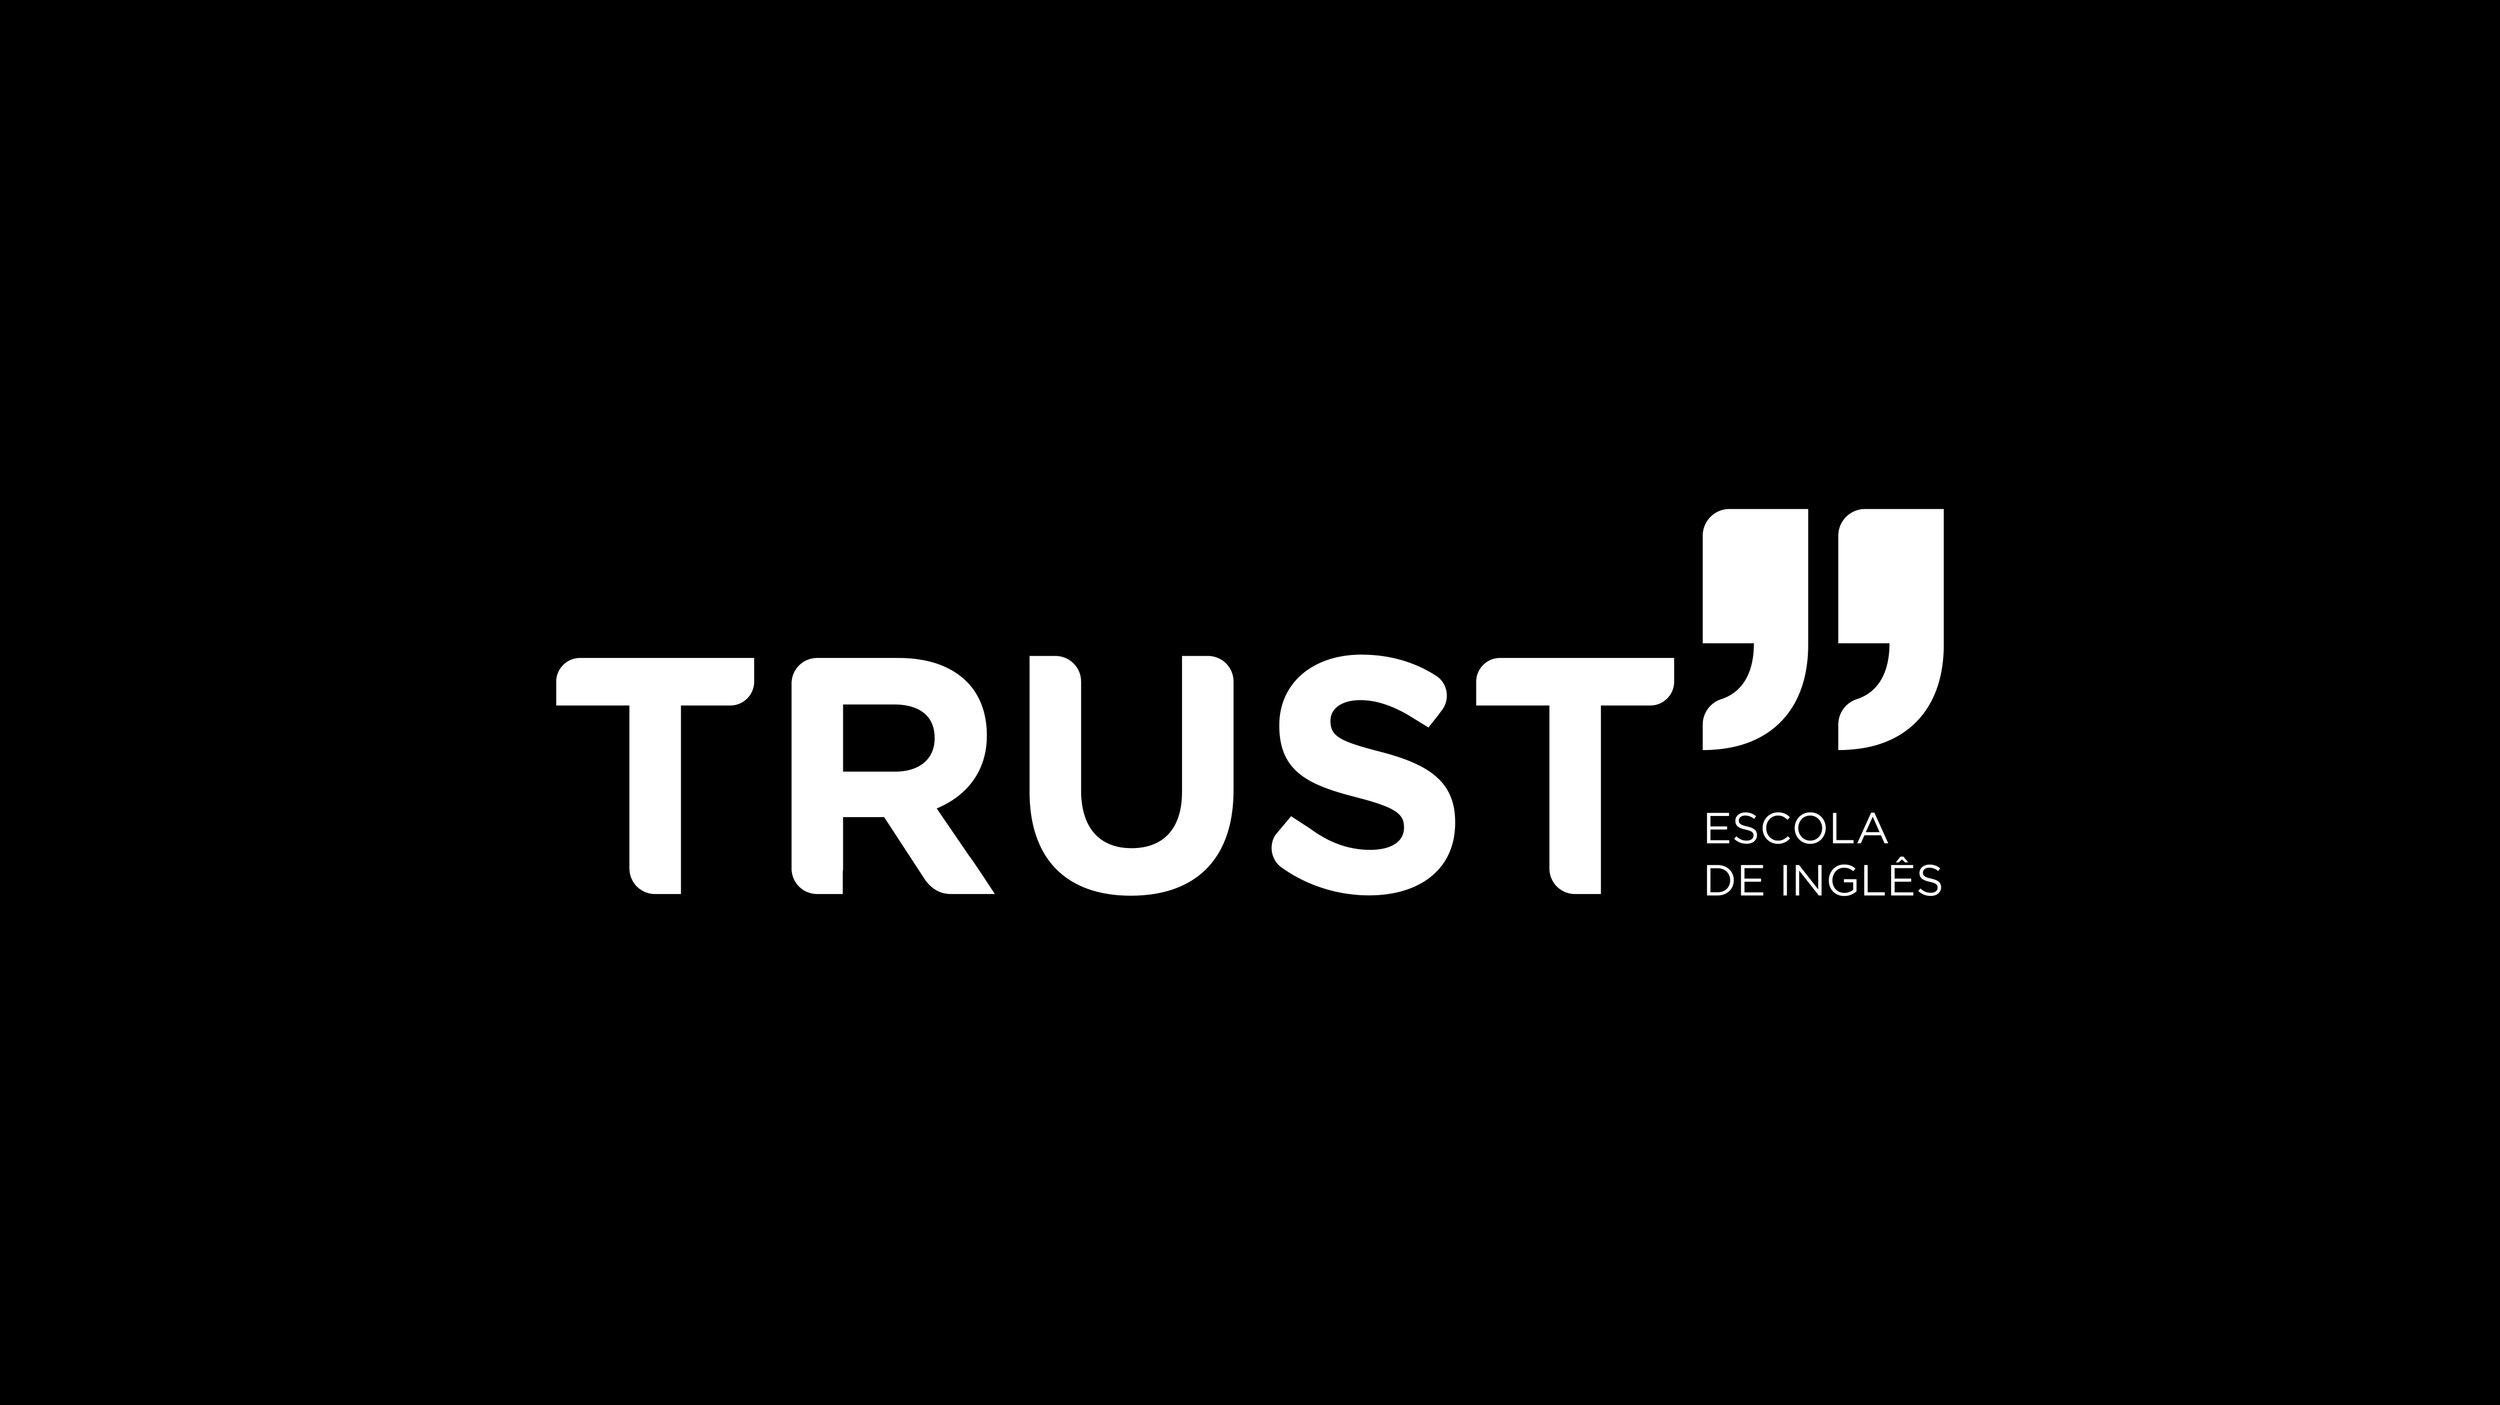 trust_final_02.jpg